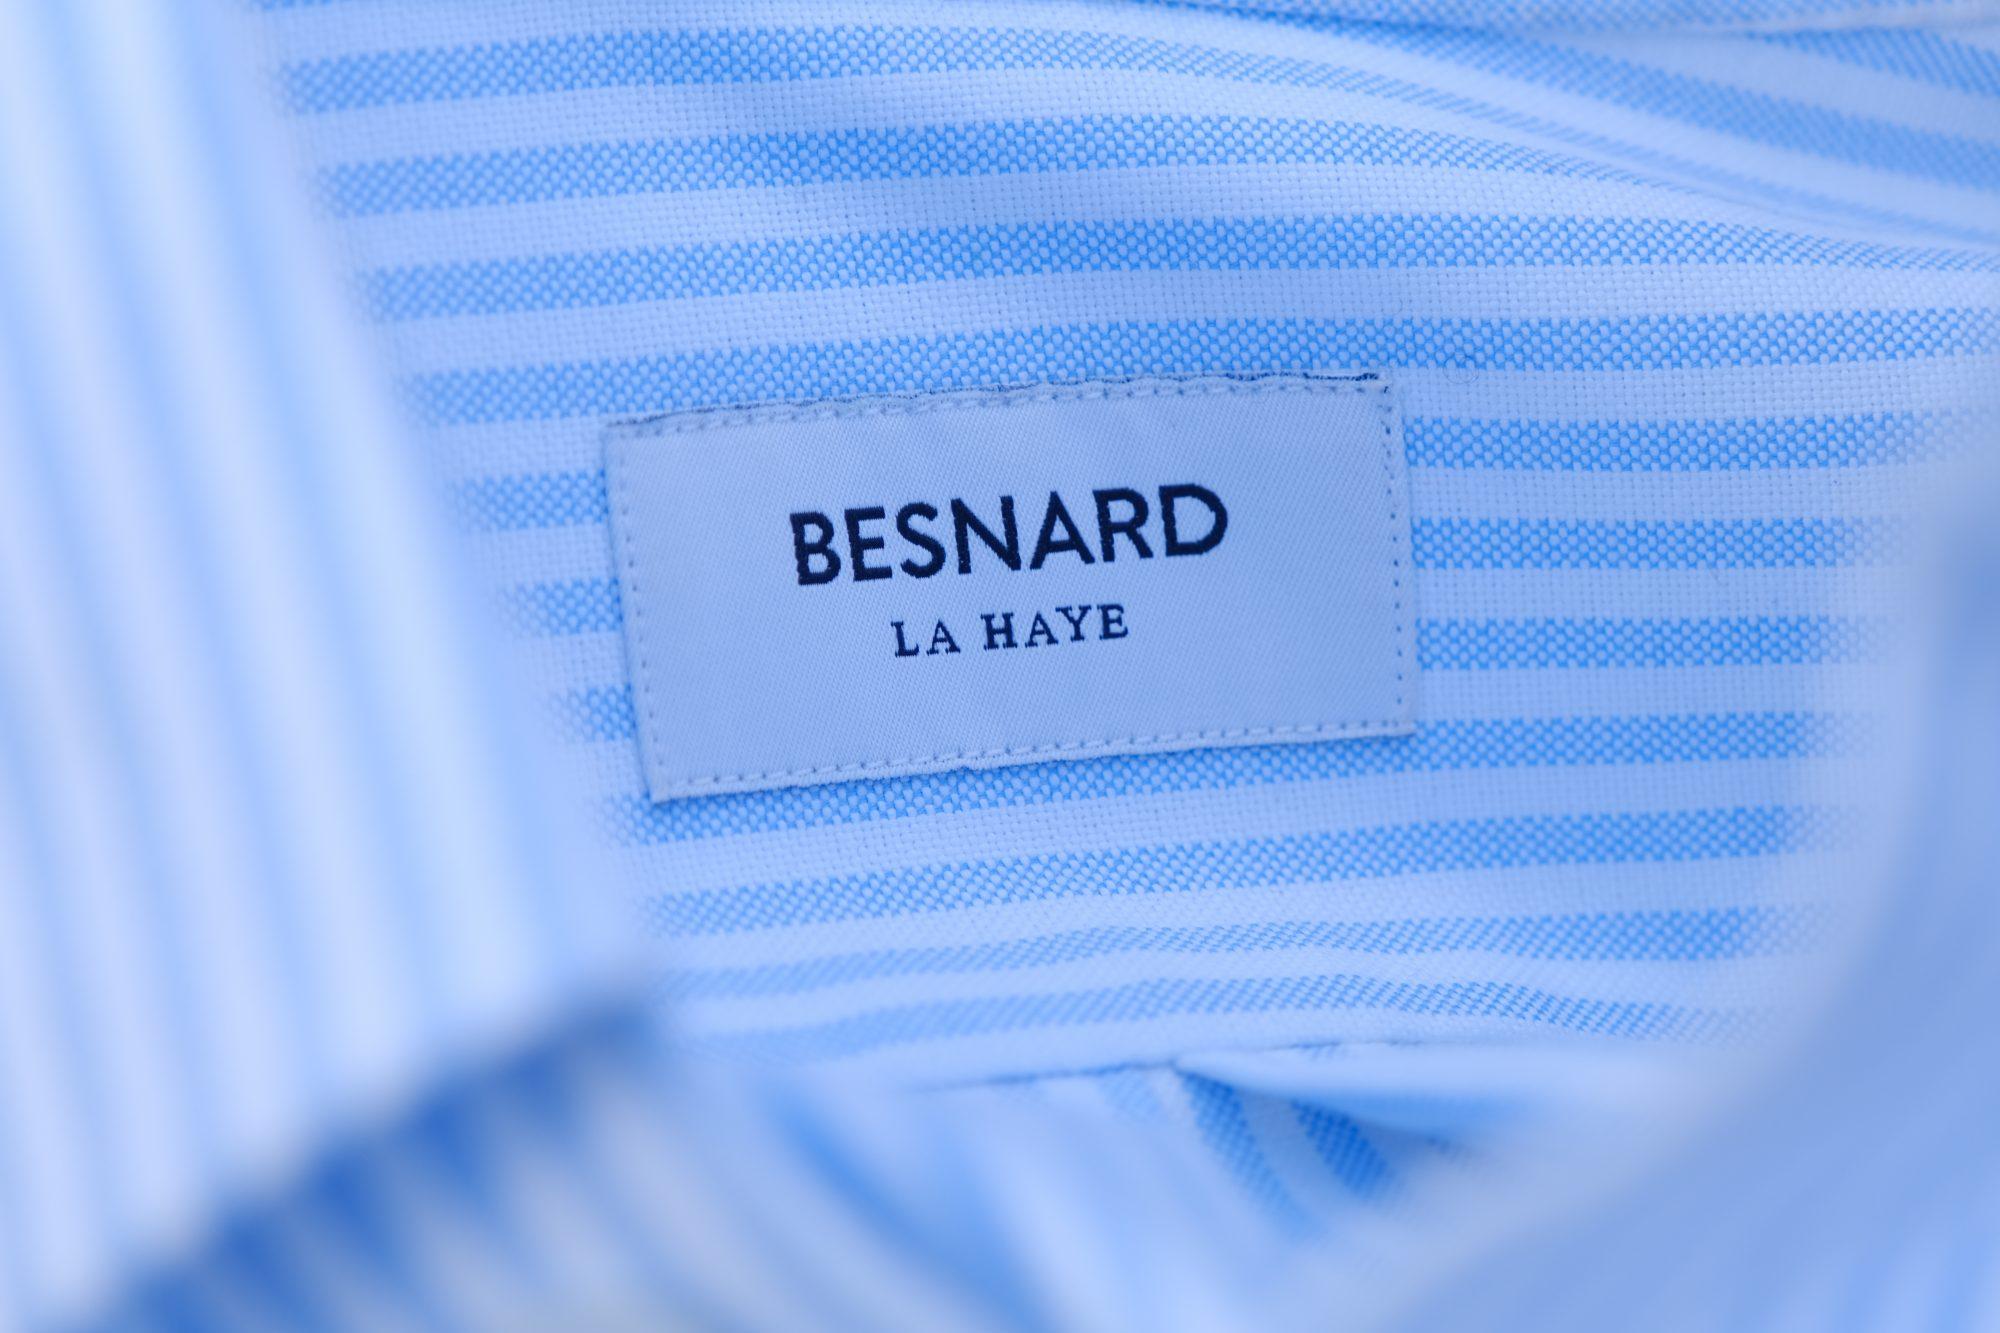 etiquette Besnard la haye chemise